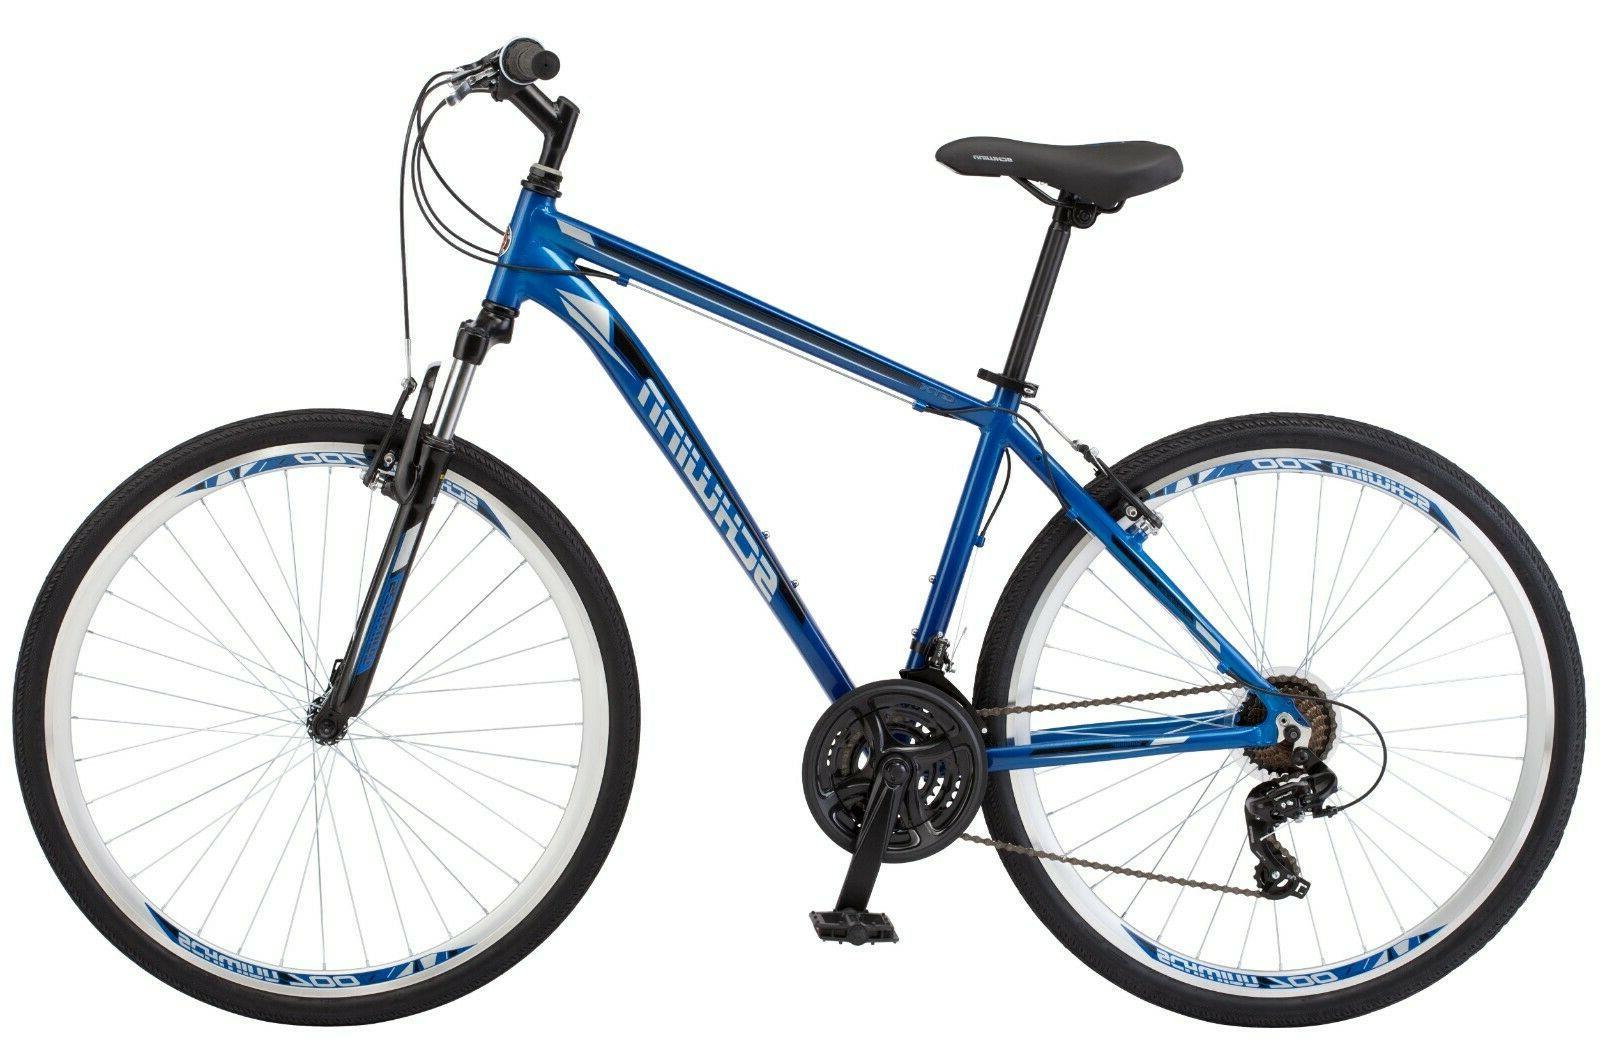 Schwinn 21-Speed 1 Bicycle Hybrid Sports